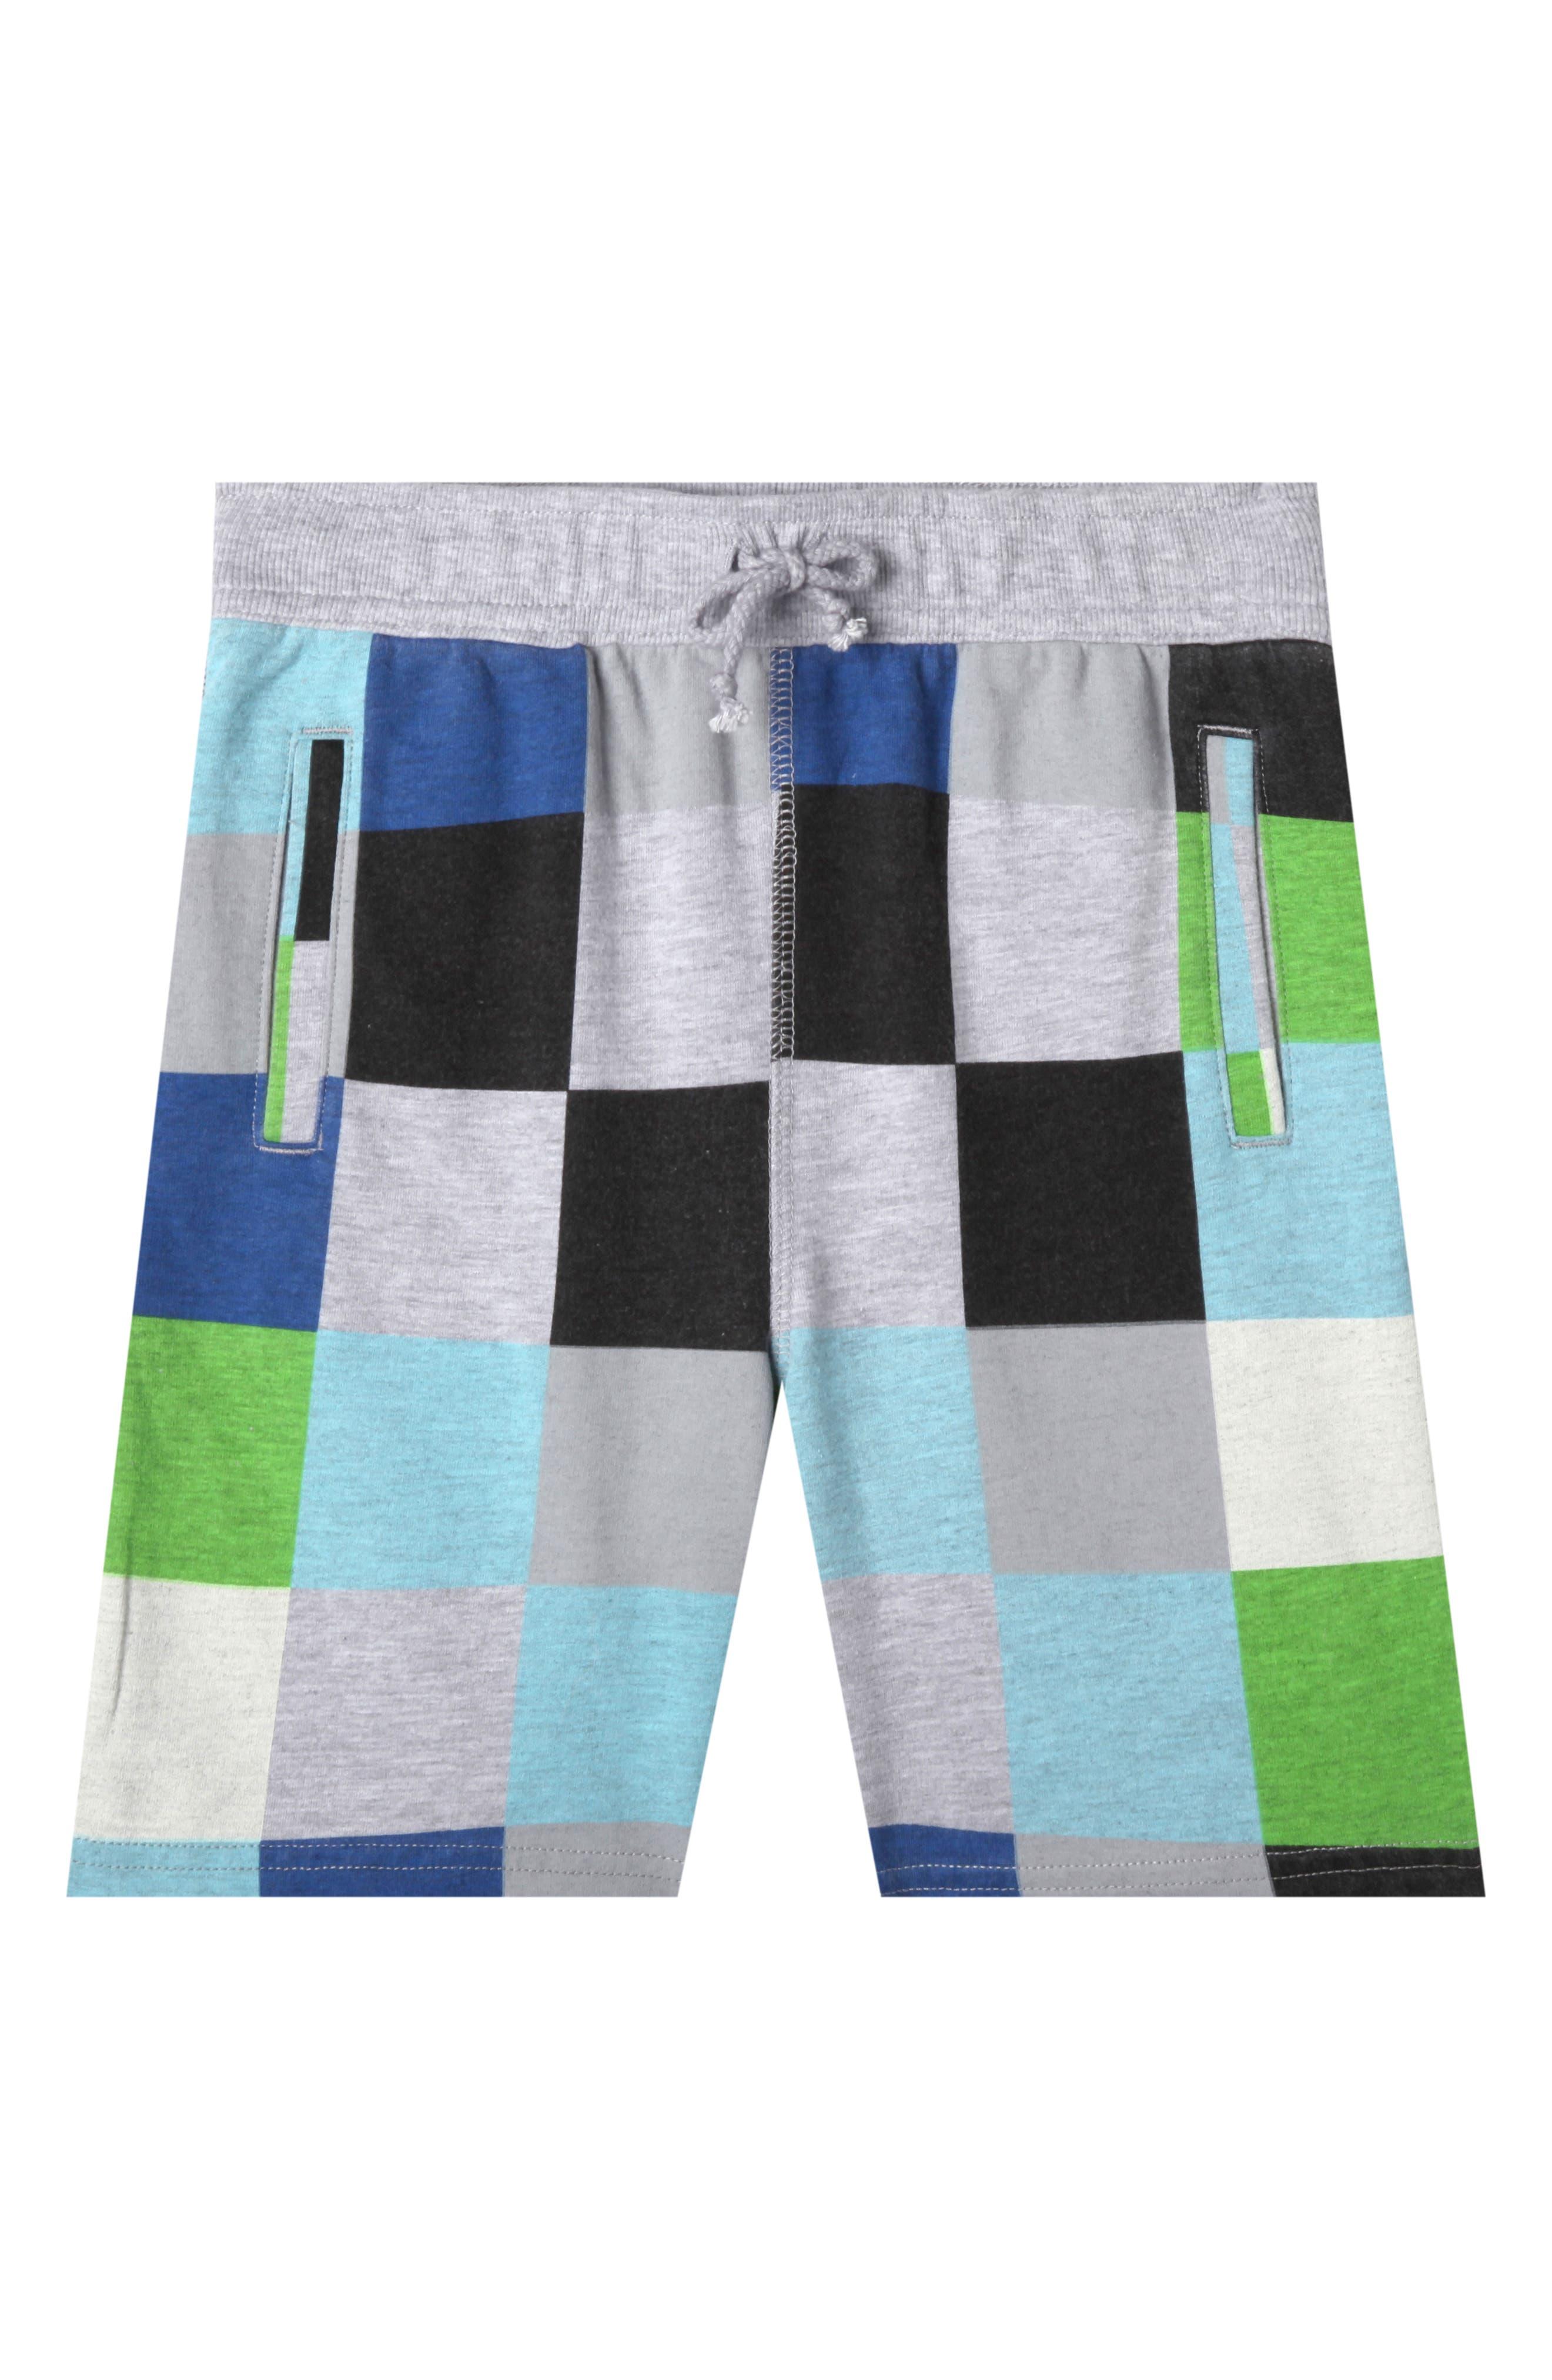 Alternate Image 1 Selected - Art & Eden Lucas Print Knit Shorts (Toddler Boys, Little Boys & Big Boys)